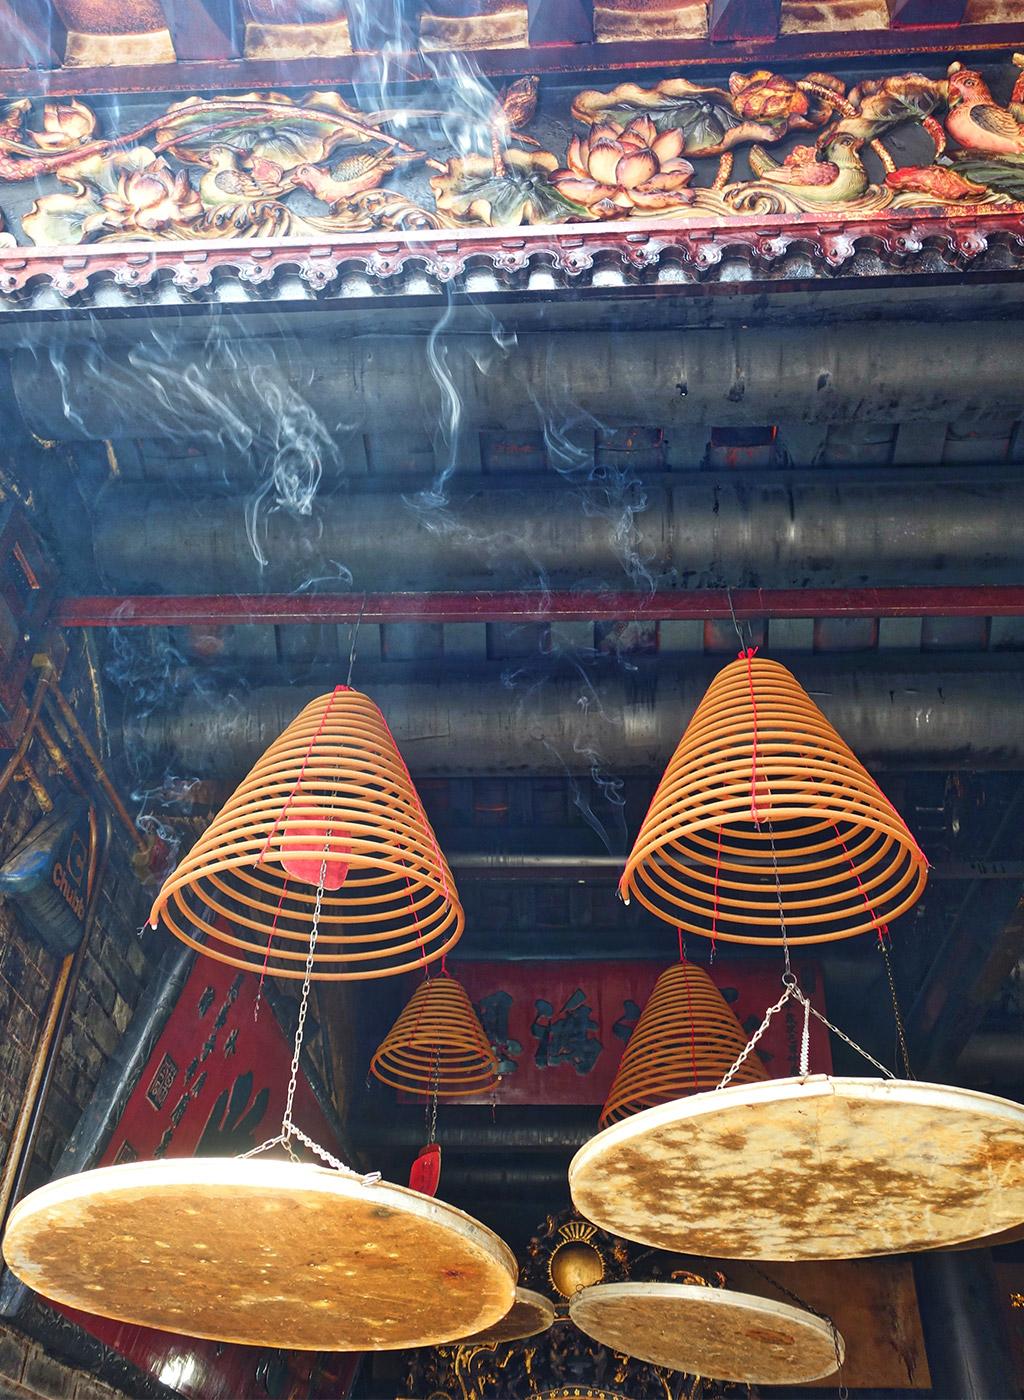 cheung-chau-hong-kong-day-trip-starting-with-a-19